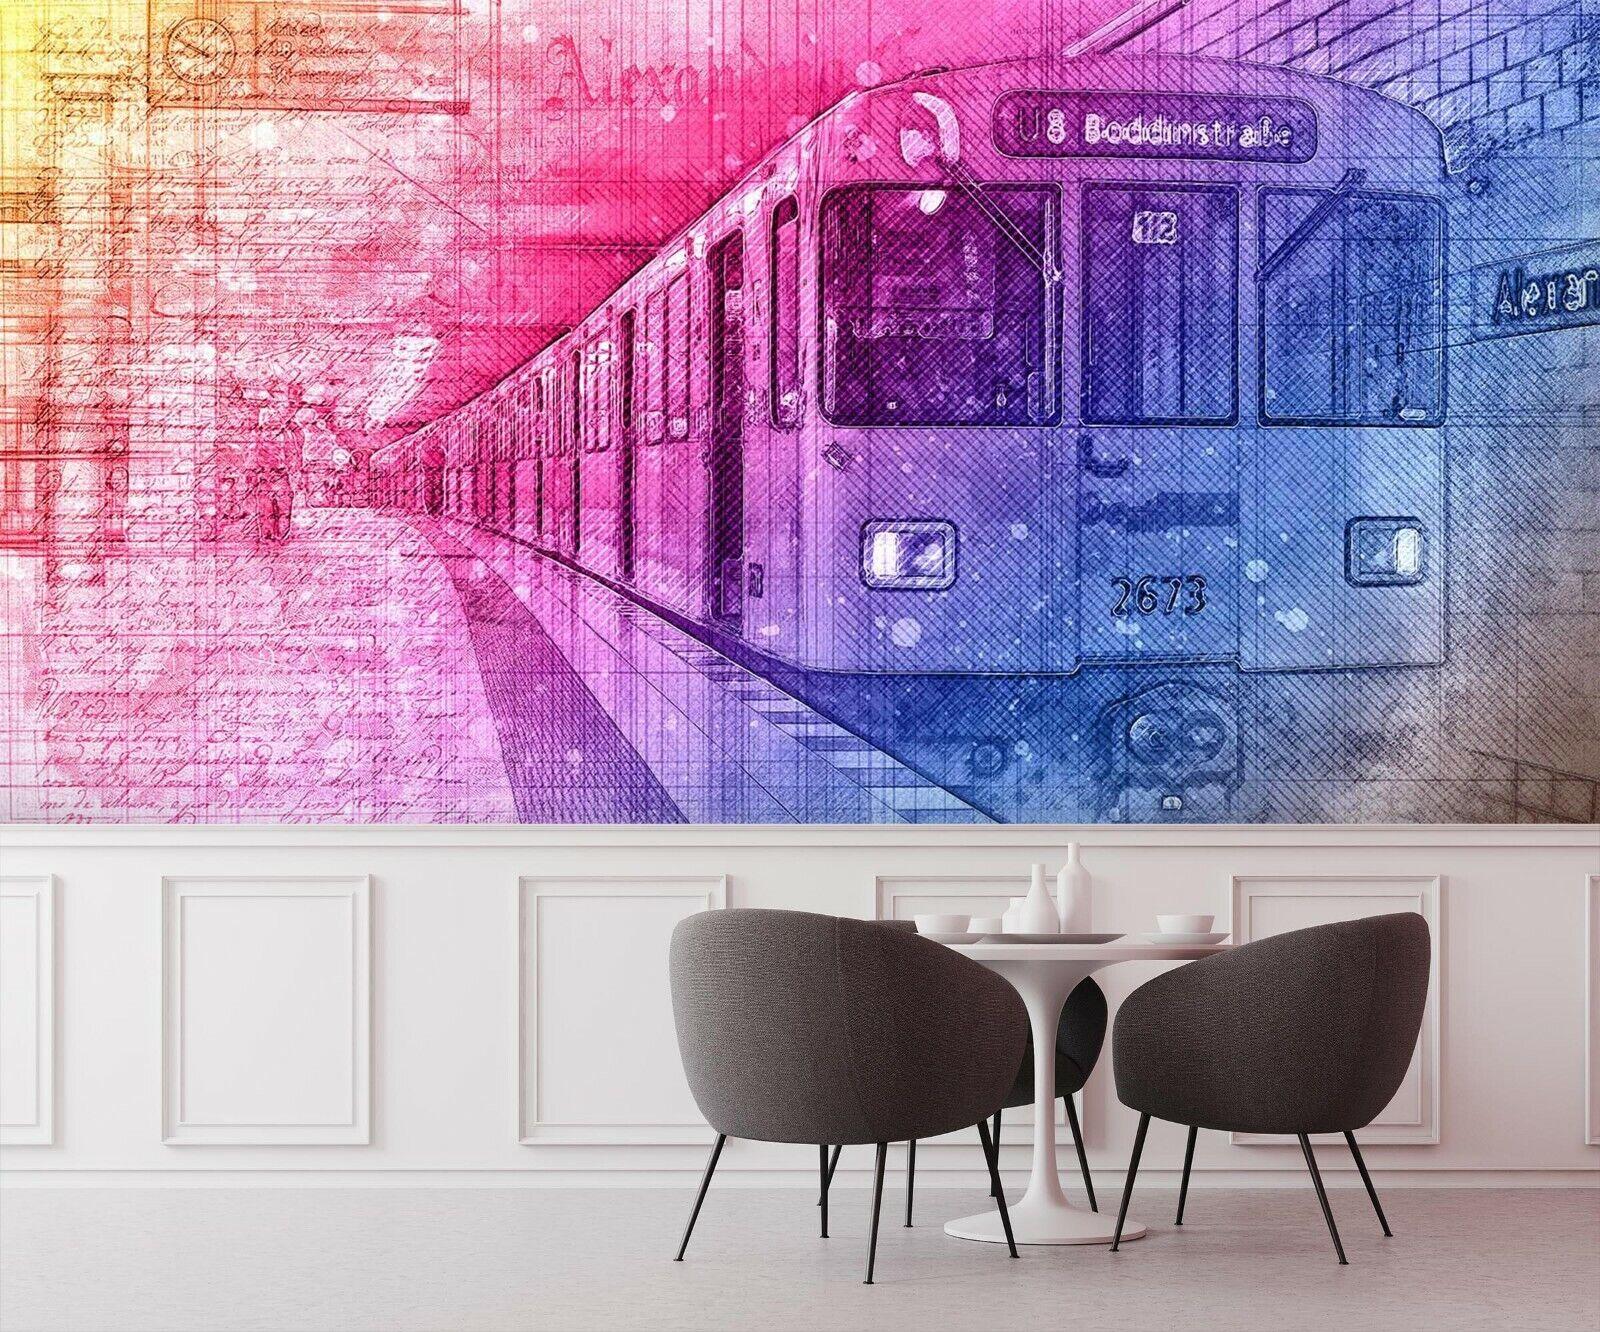 3D Train I64 Transport Wallpaper Mural Sefl-adhesive Removable Angelia